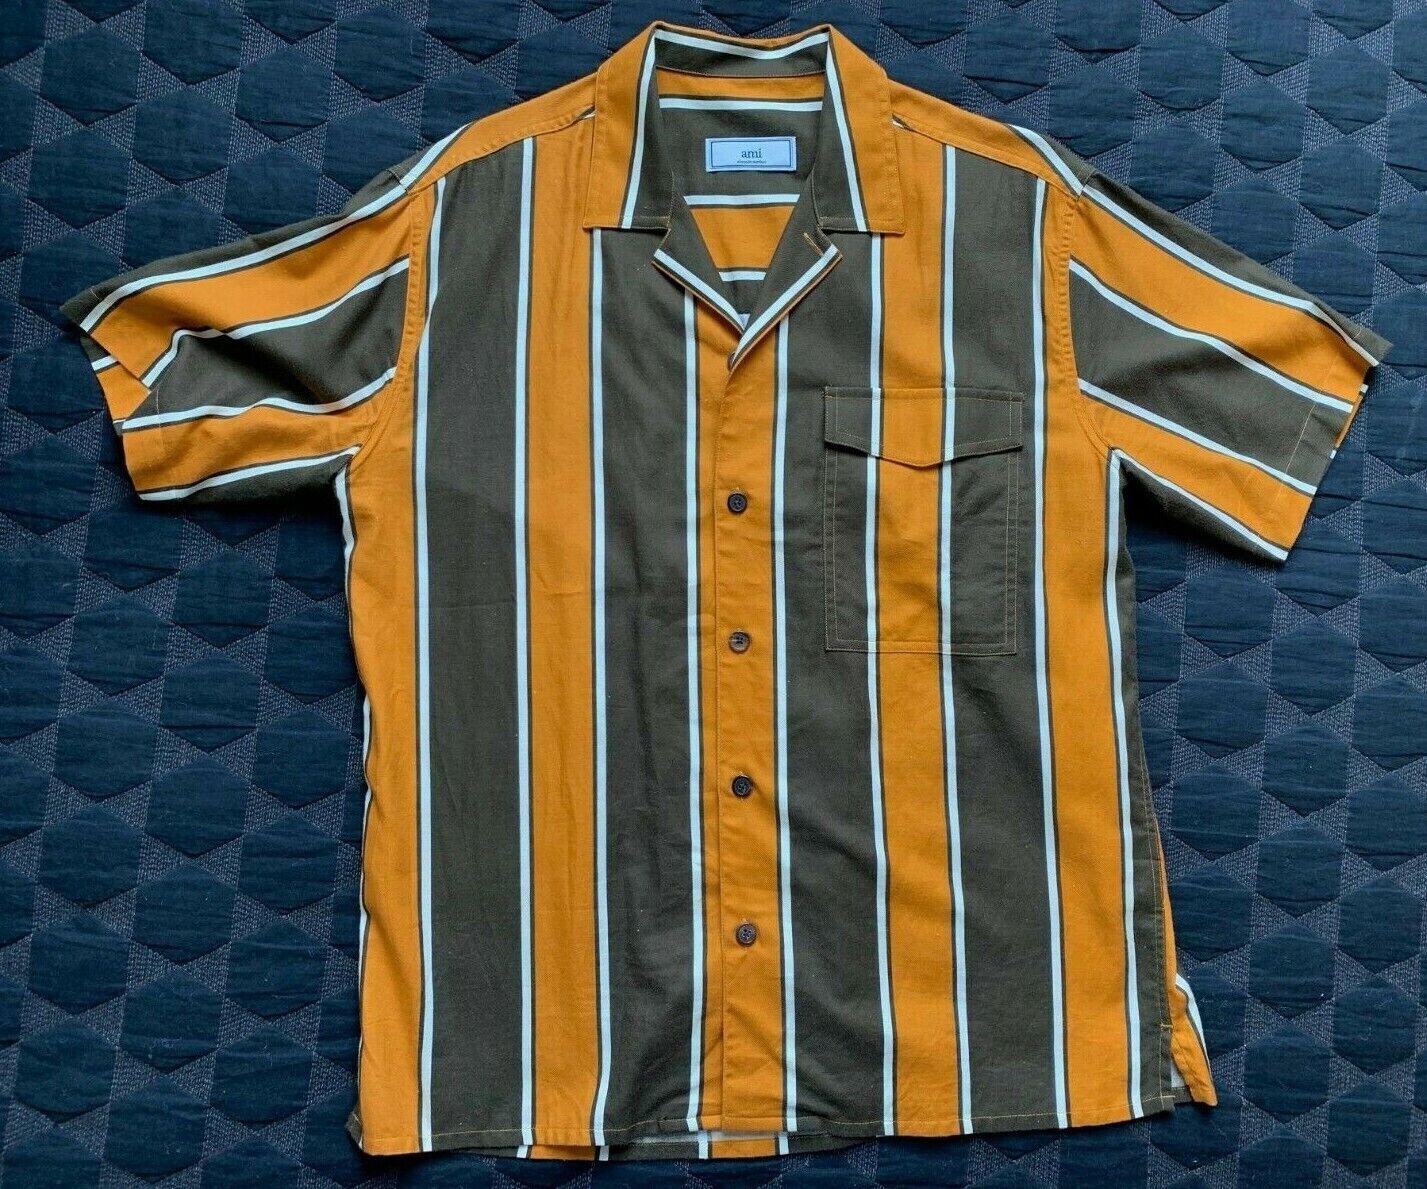 AMI - Alexandre Mattiussi Camp Collar Striped Shirt, Size 40 M-L